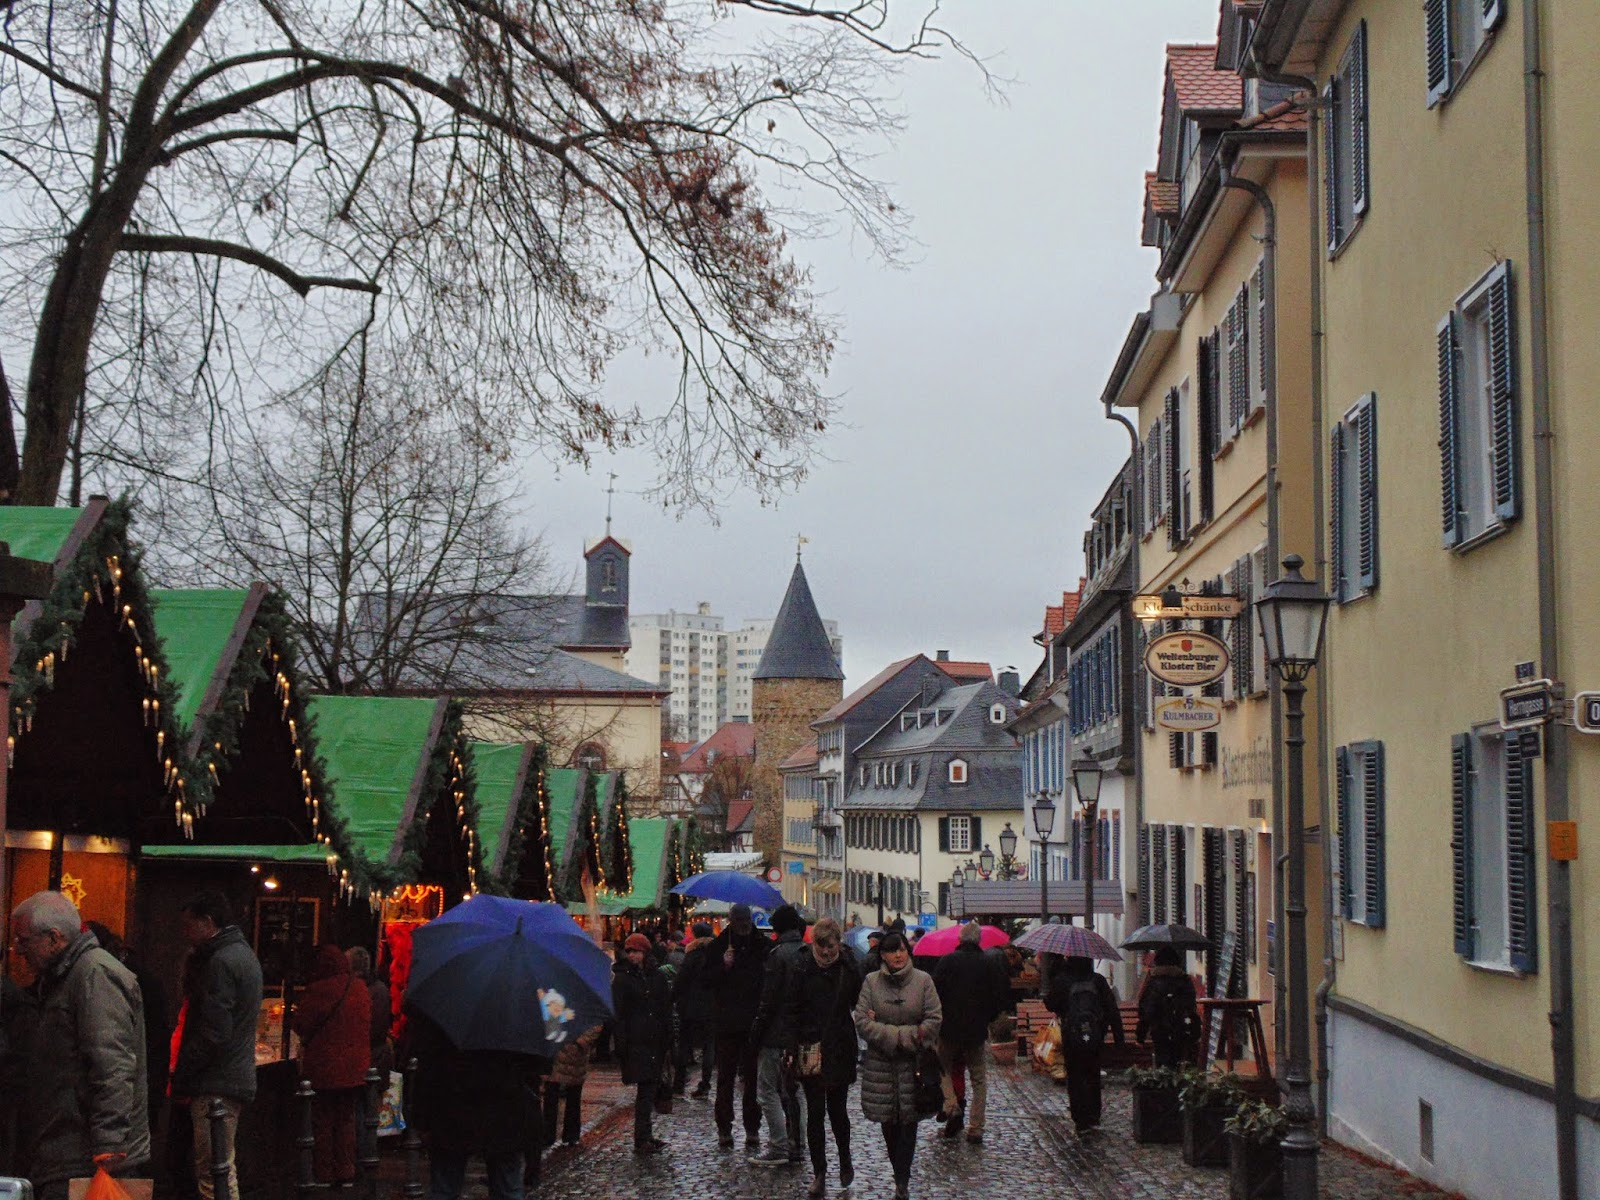 Markt Bad Homburg